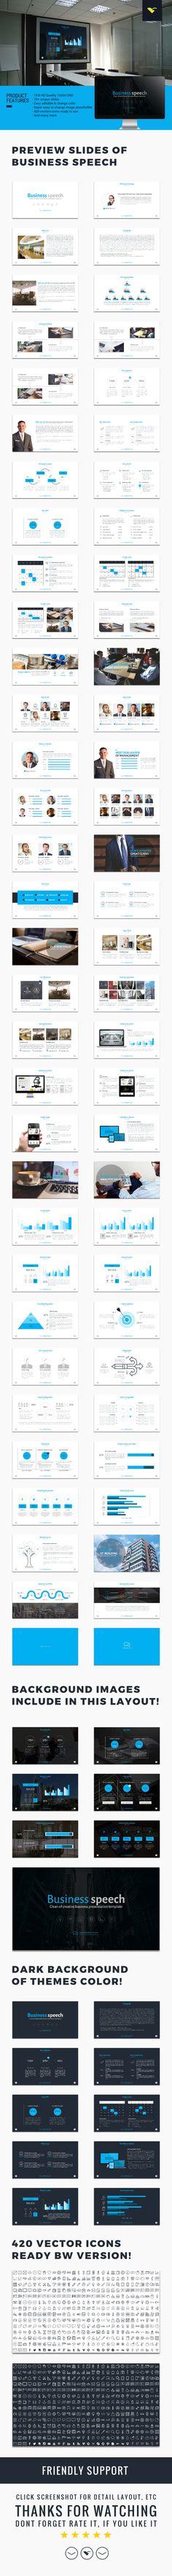 Business speech google slide presentation Template #design #slides Download: http://graphicriver.net/item/business-speech-google-slide-presentation-template/13654381?ref=ksioks